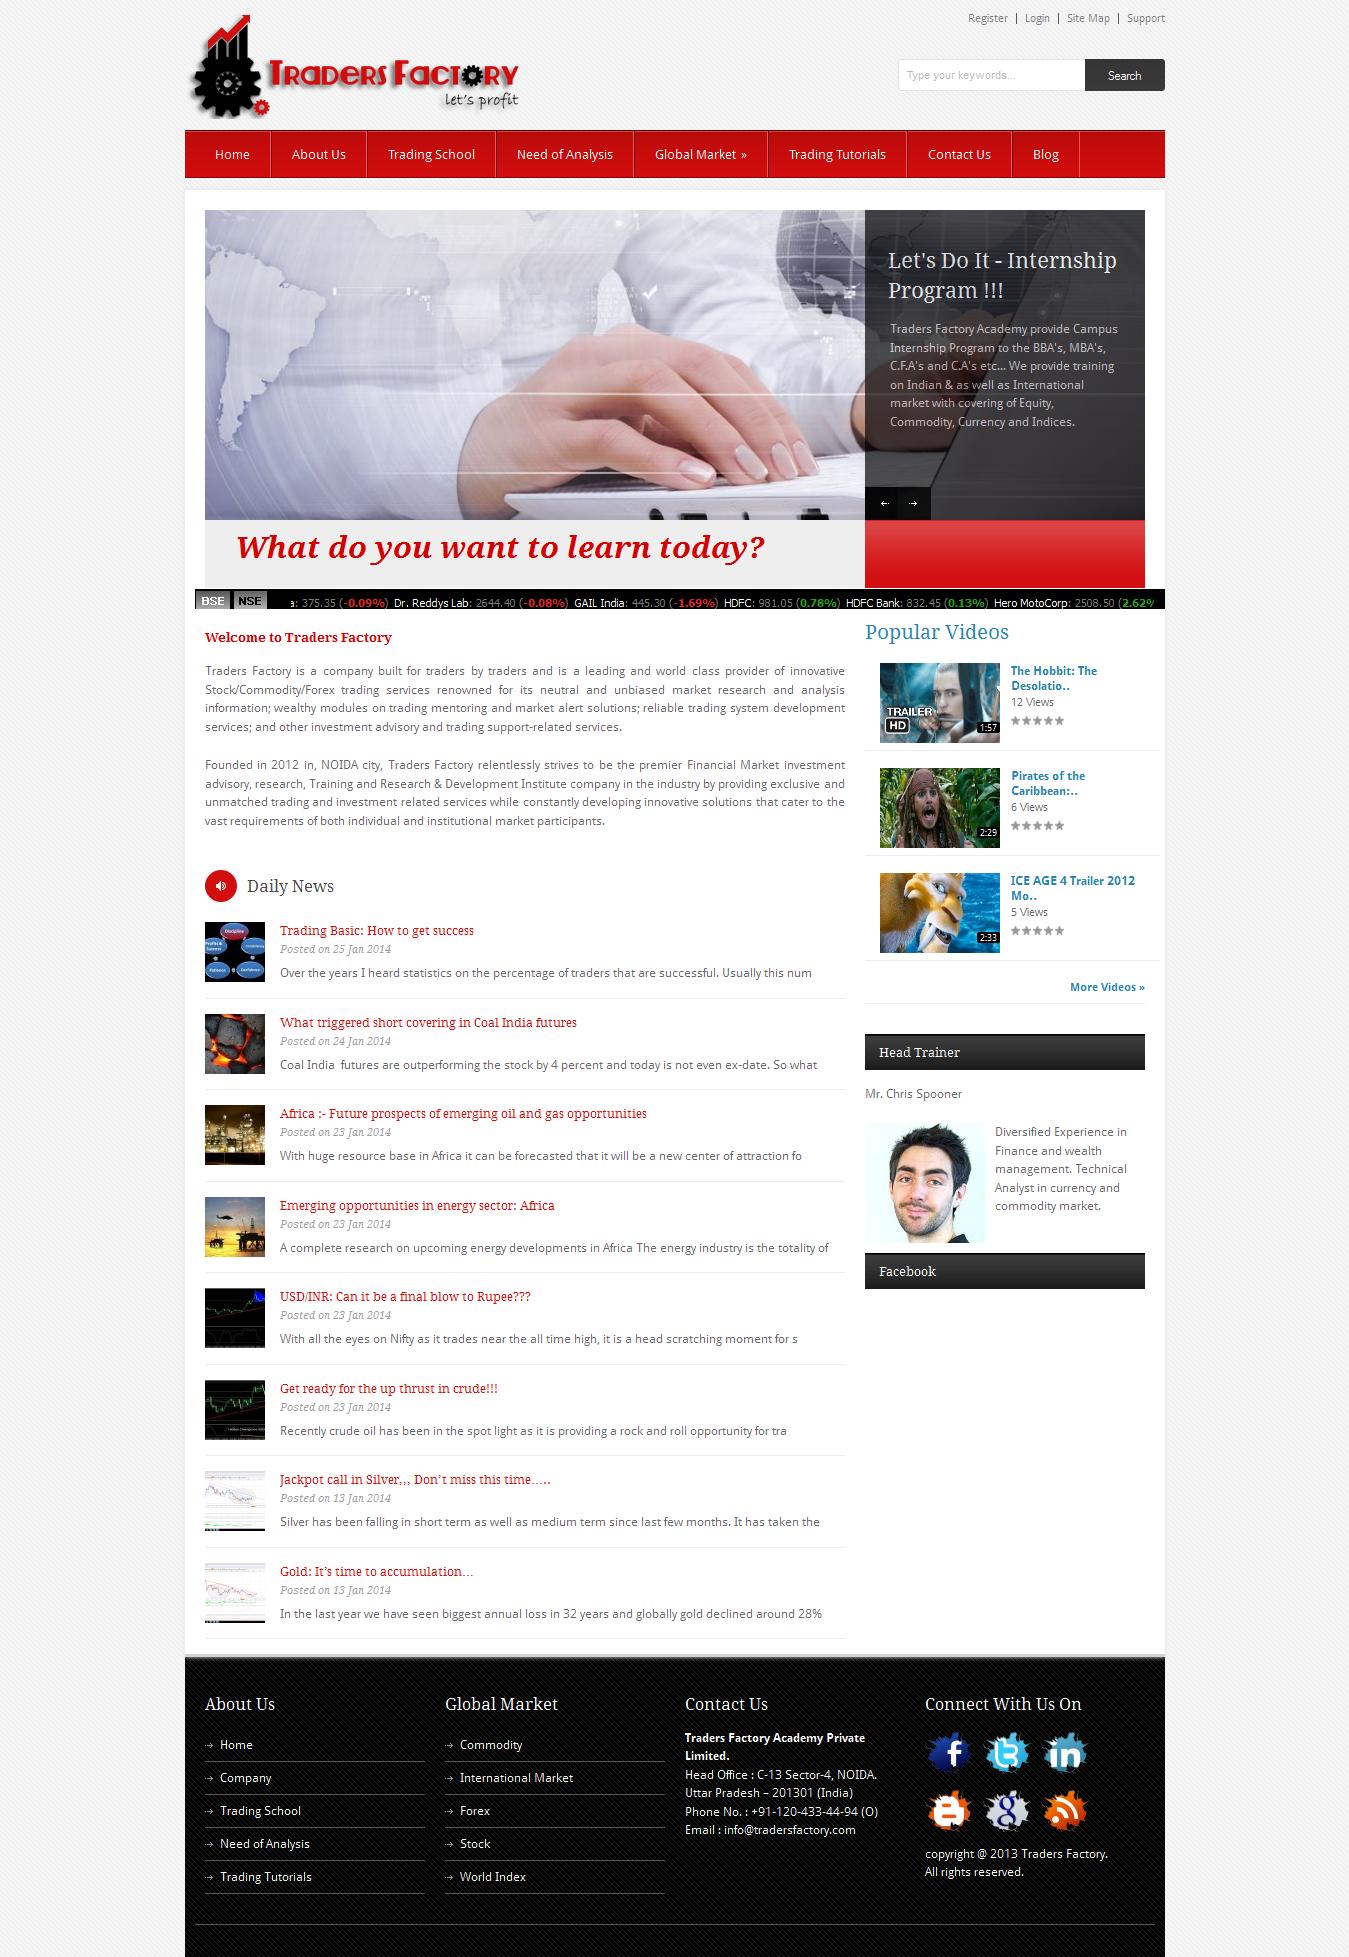 tradersfactory_com_homepage.png